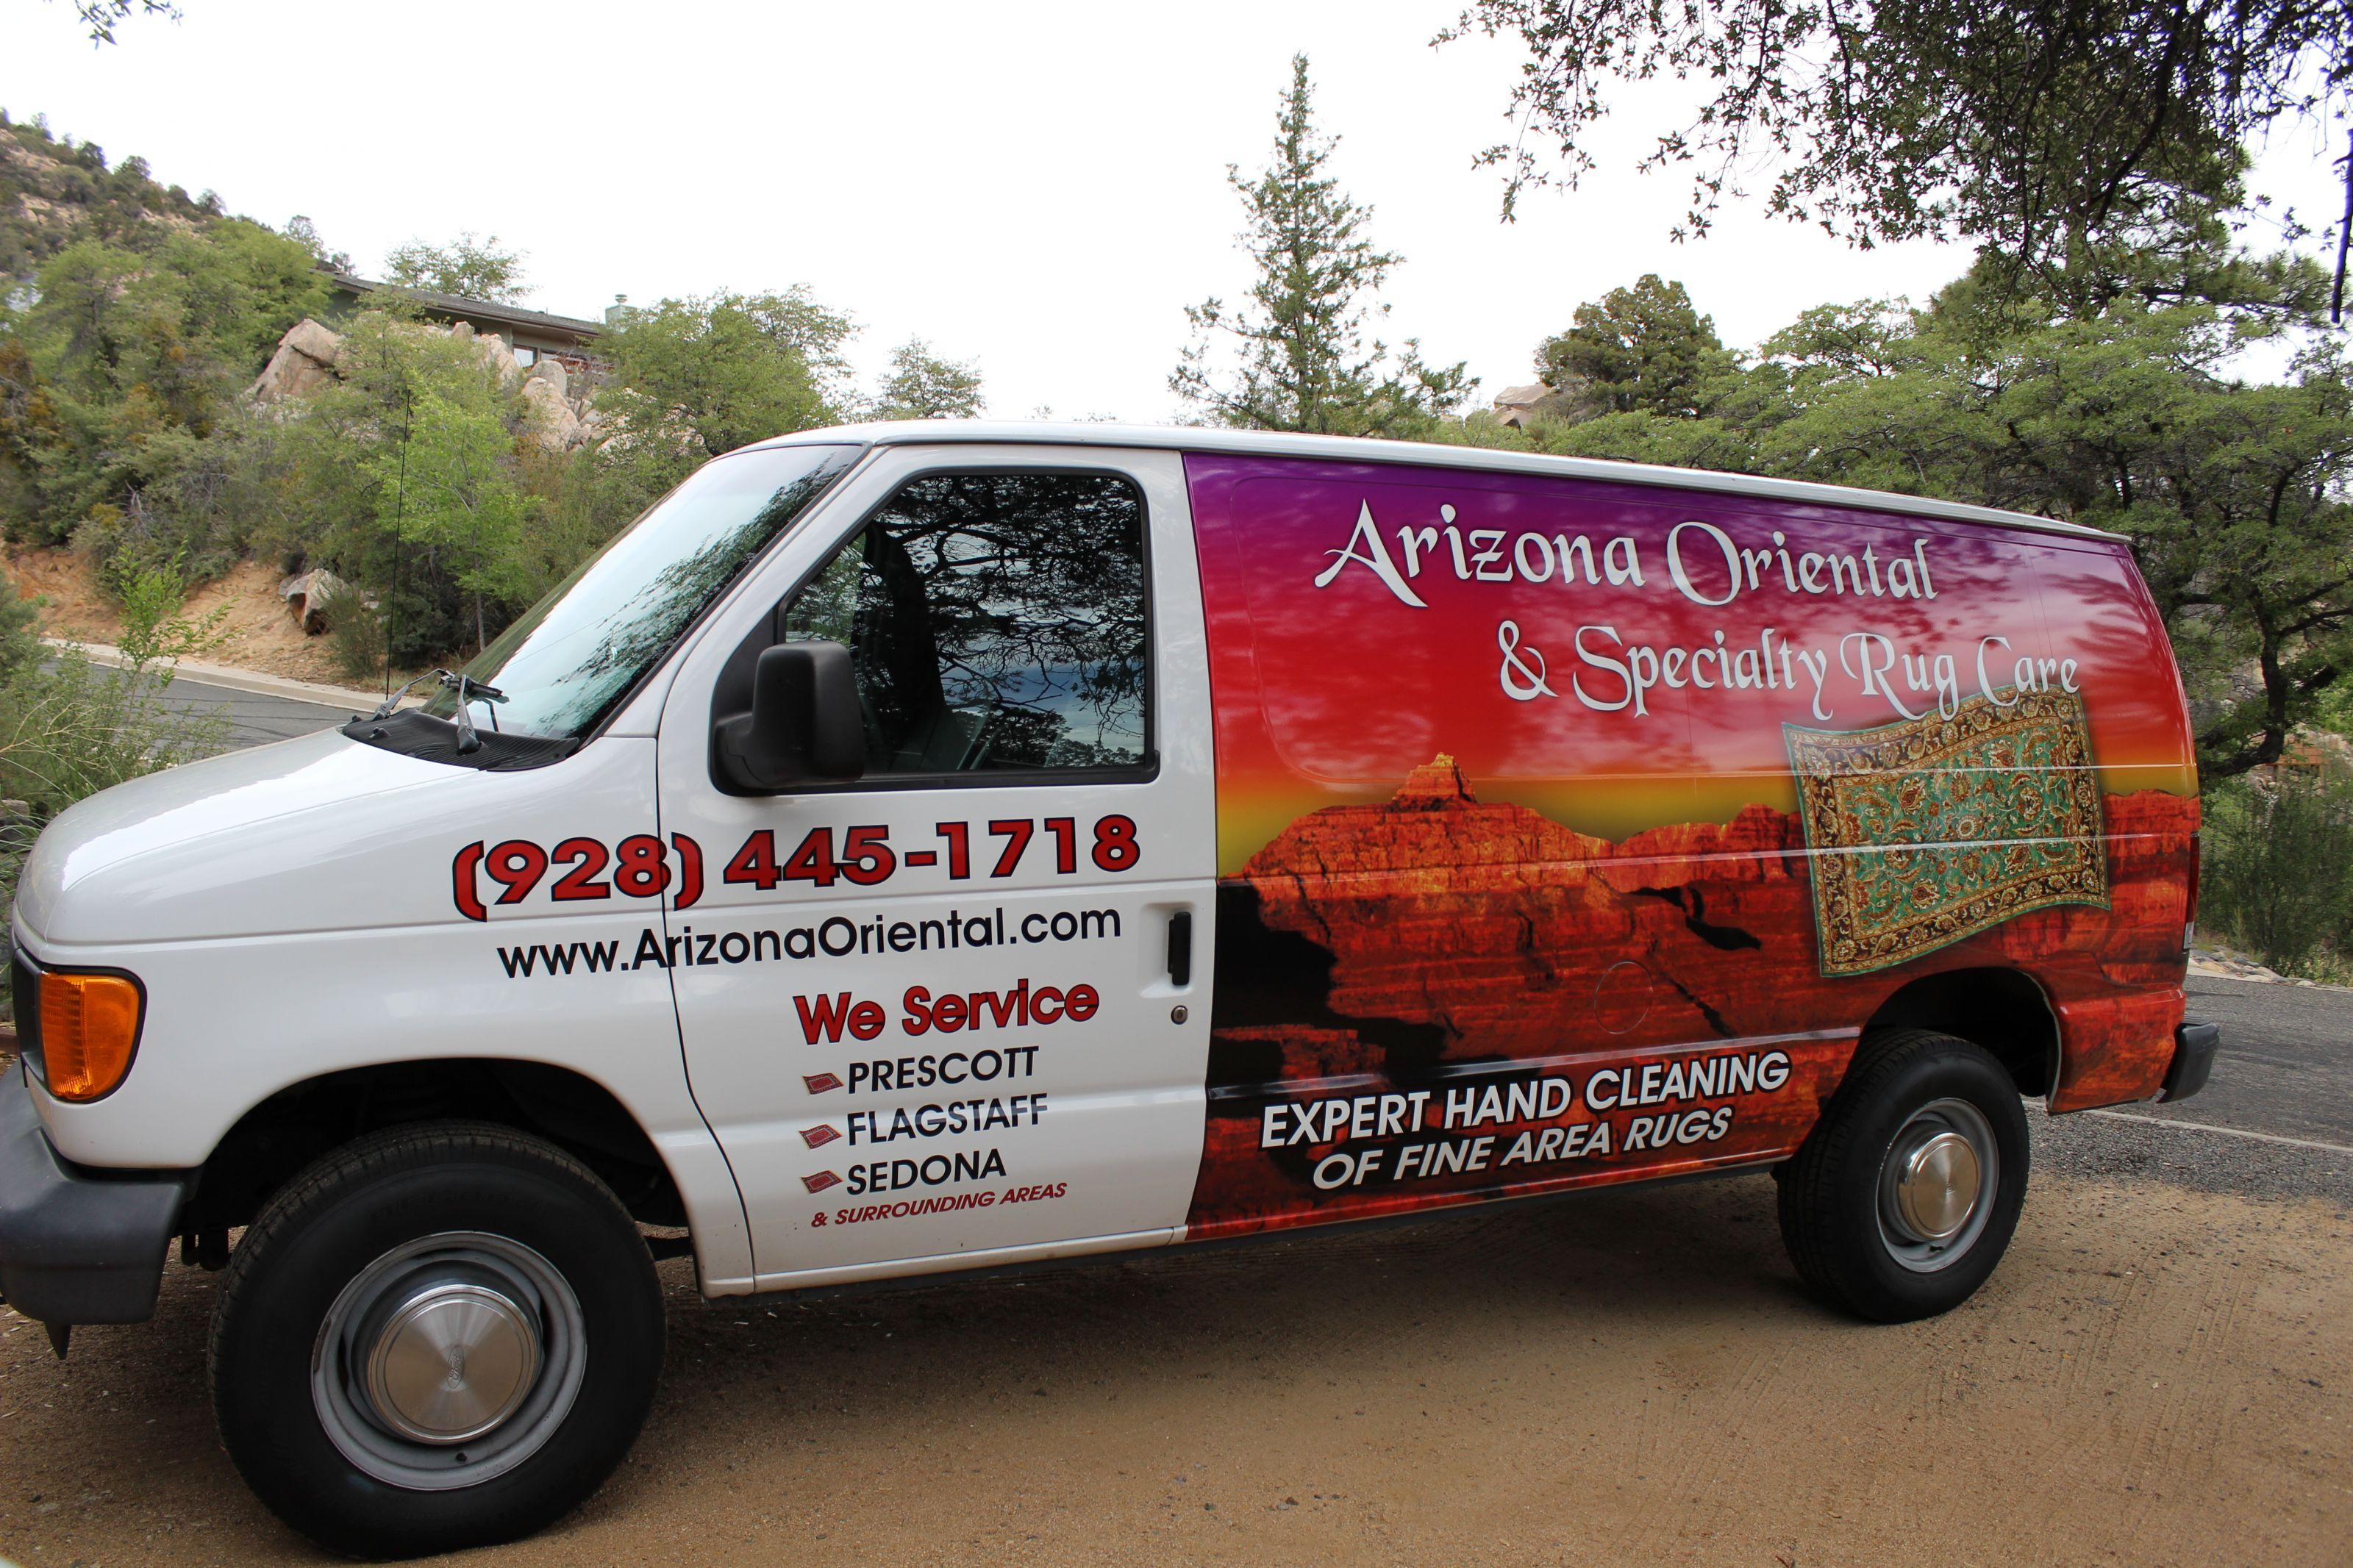 Rug Cleaning Company Prescott Valley Az